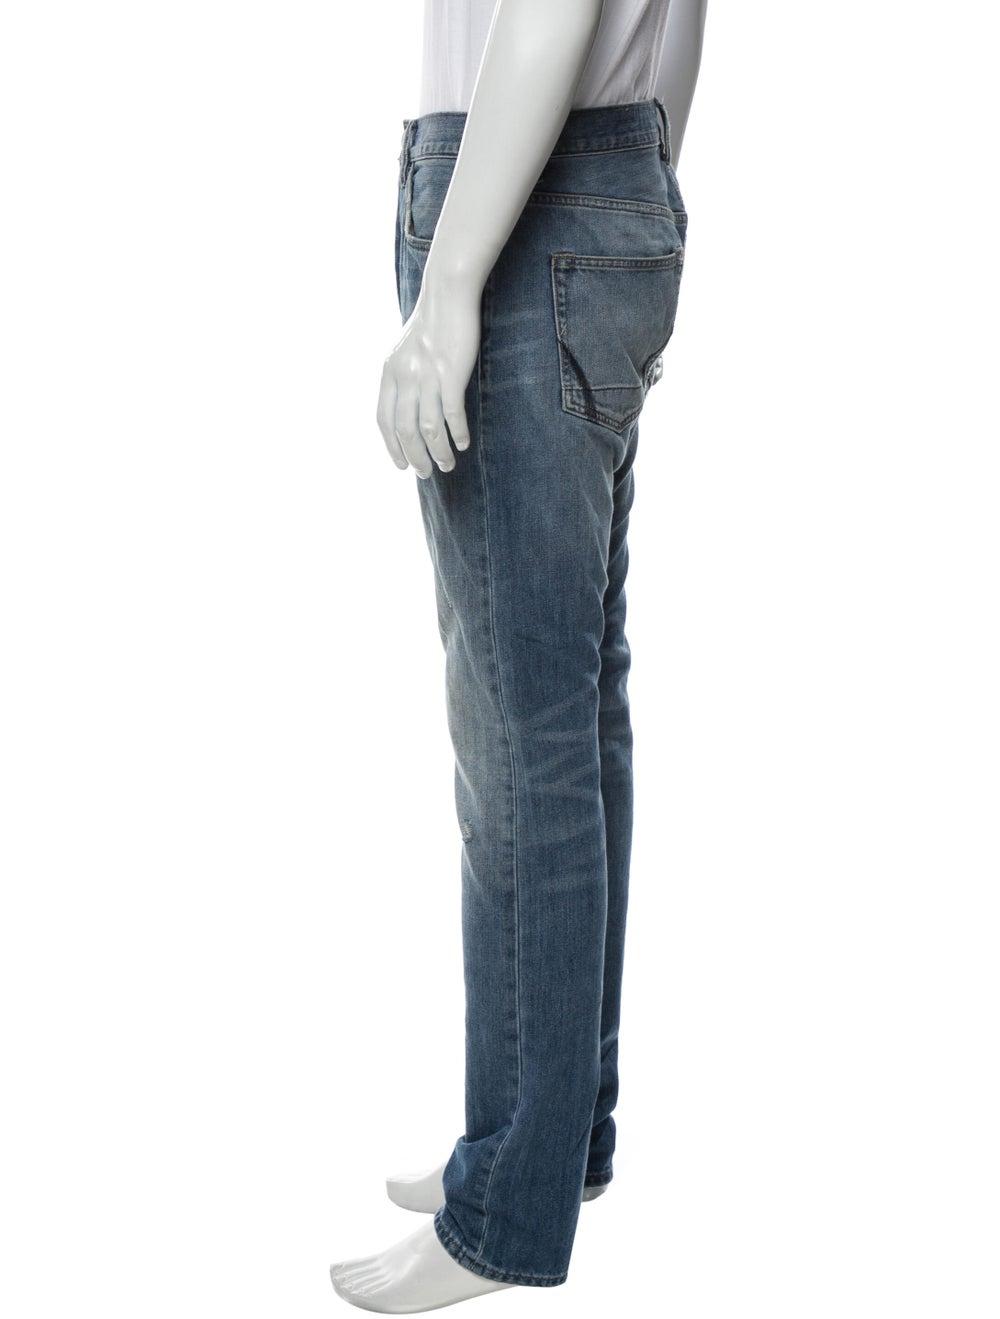 AllSaints Skinny Jeans Blue - image 2